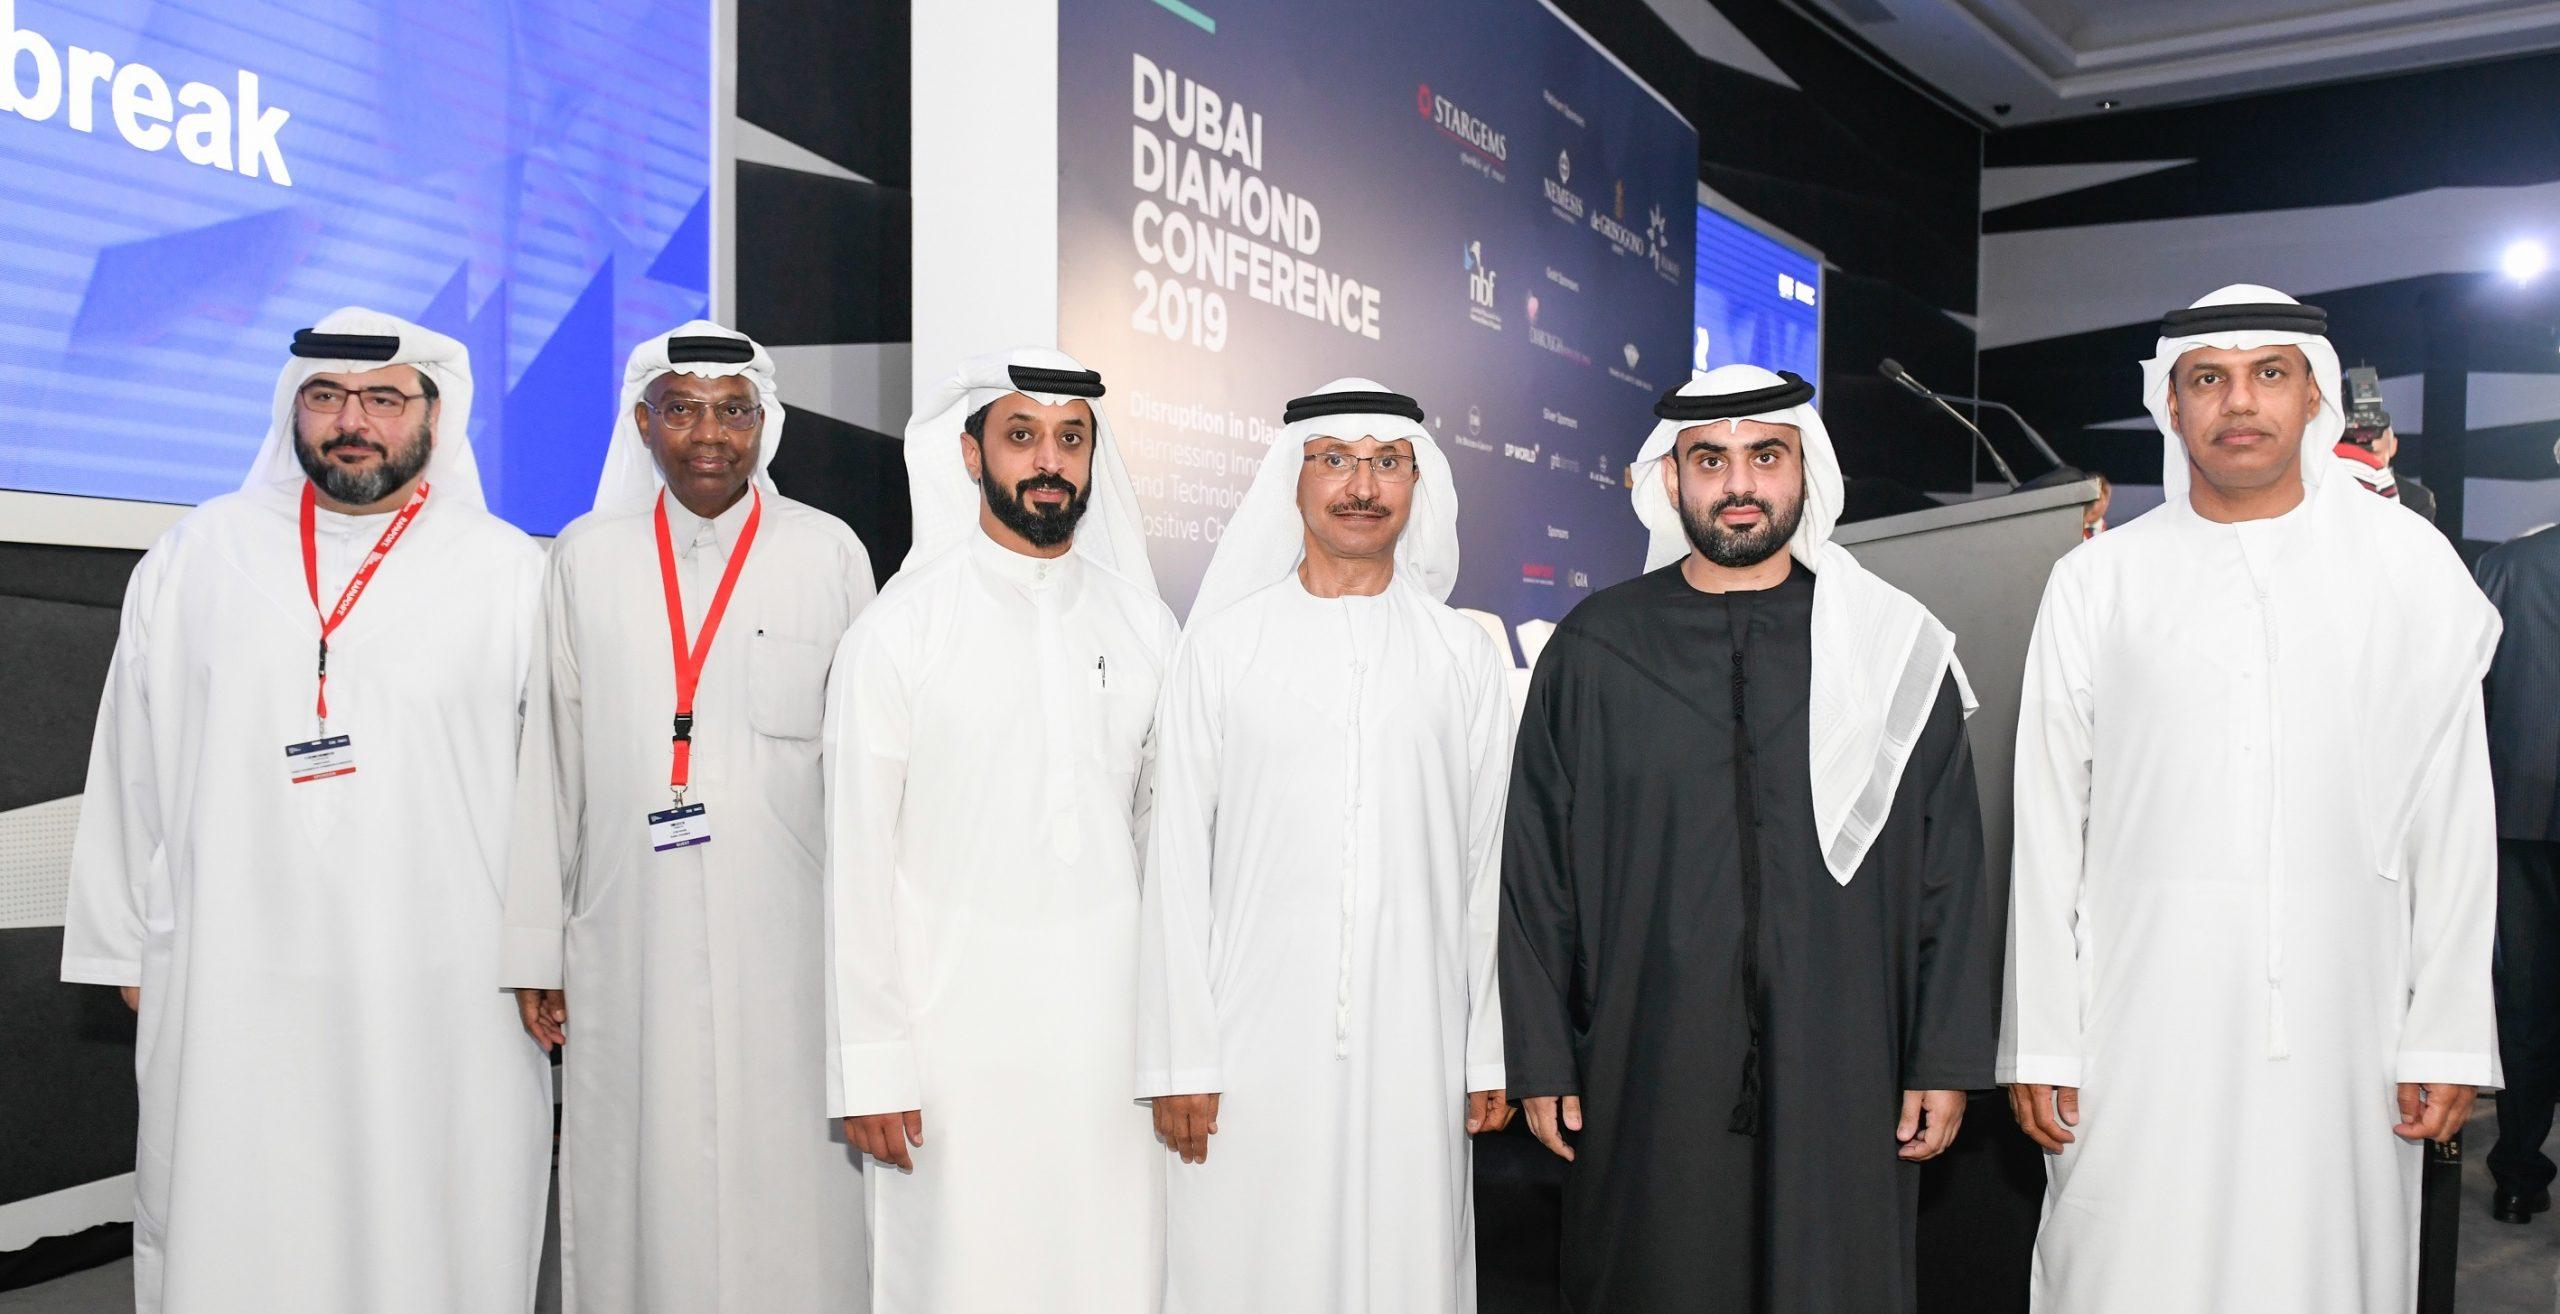 H.E. Ahmed Mahboob Musabih, Director General of Dubai Customs; · Sheikh Ahmed Bin Mana Al Maktoum; · H.E. Sultan Ahmed Bin Sulayem, Group Chairman and CEO, Ahmed Bin Sulayem, Atiq Juma Nasib,